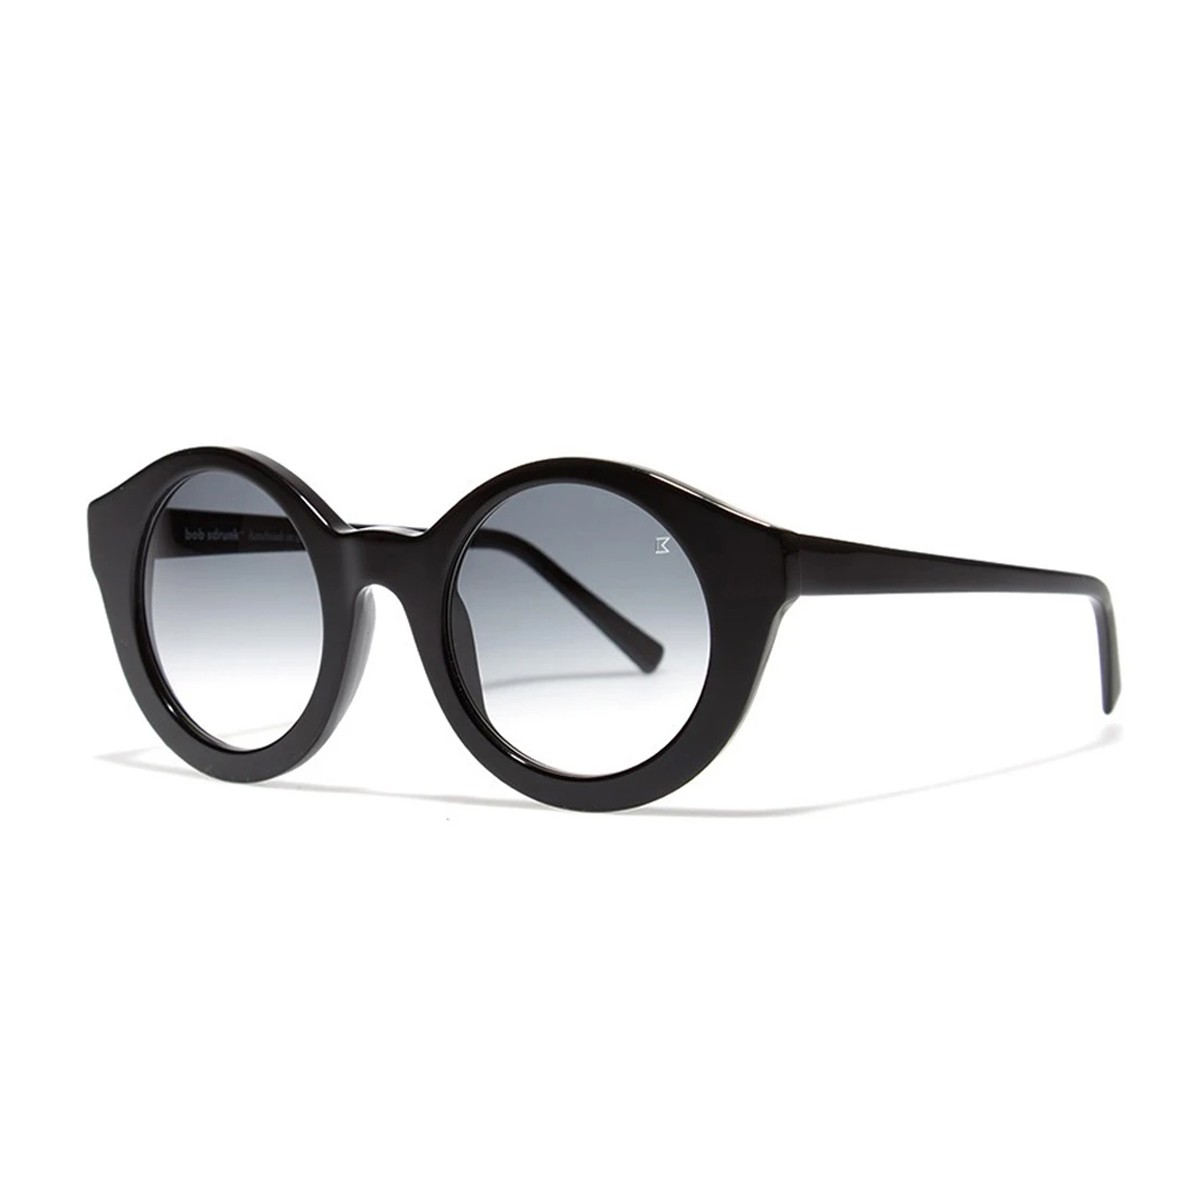 Bob Sdrunk Amalia/s   Women's sunglasses